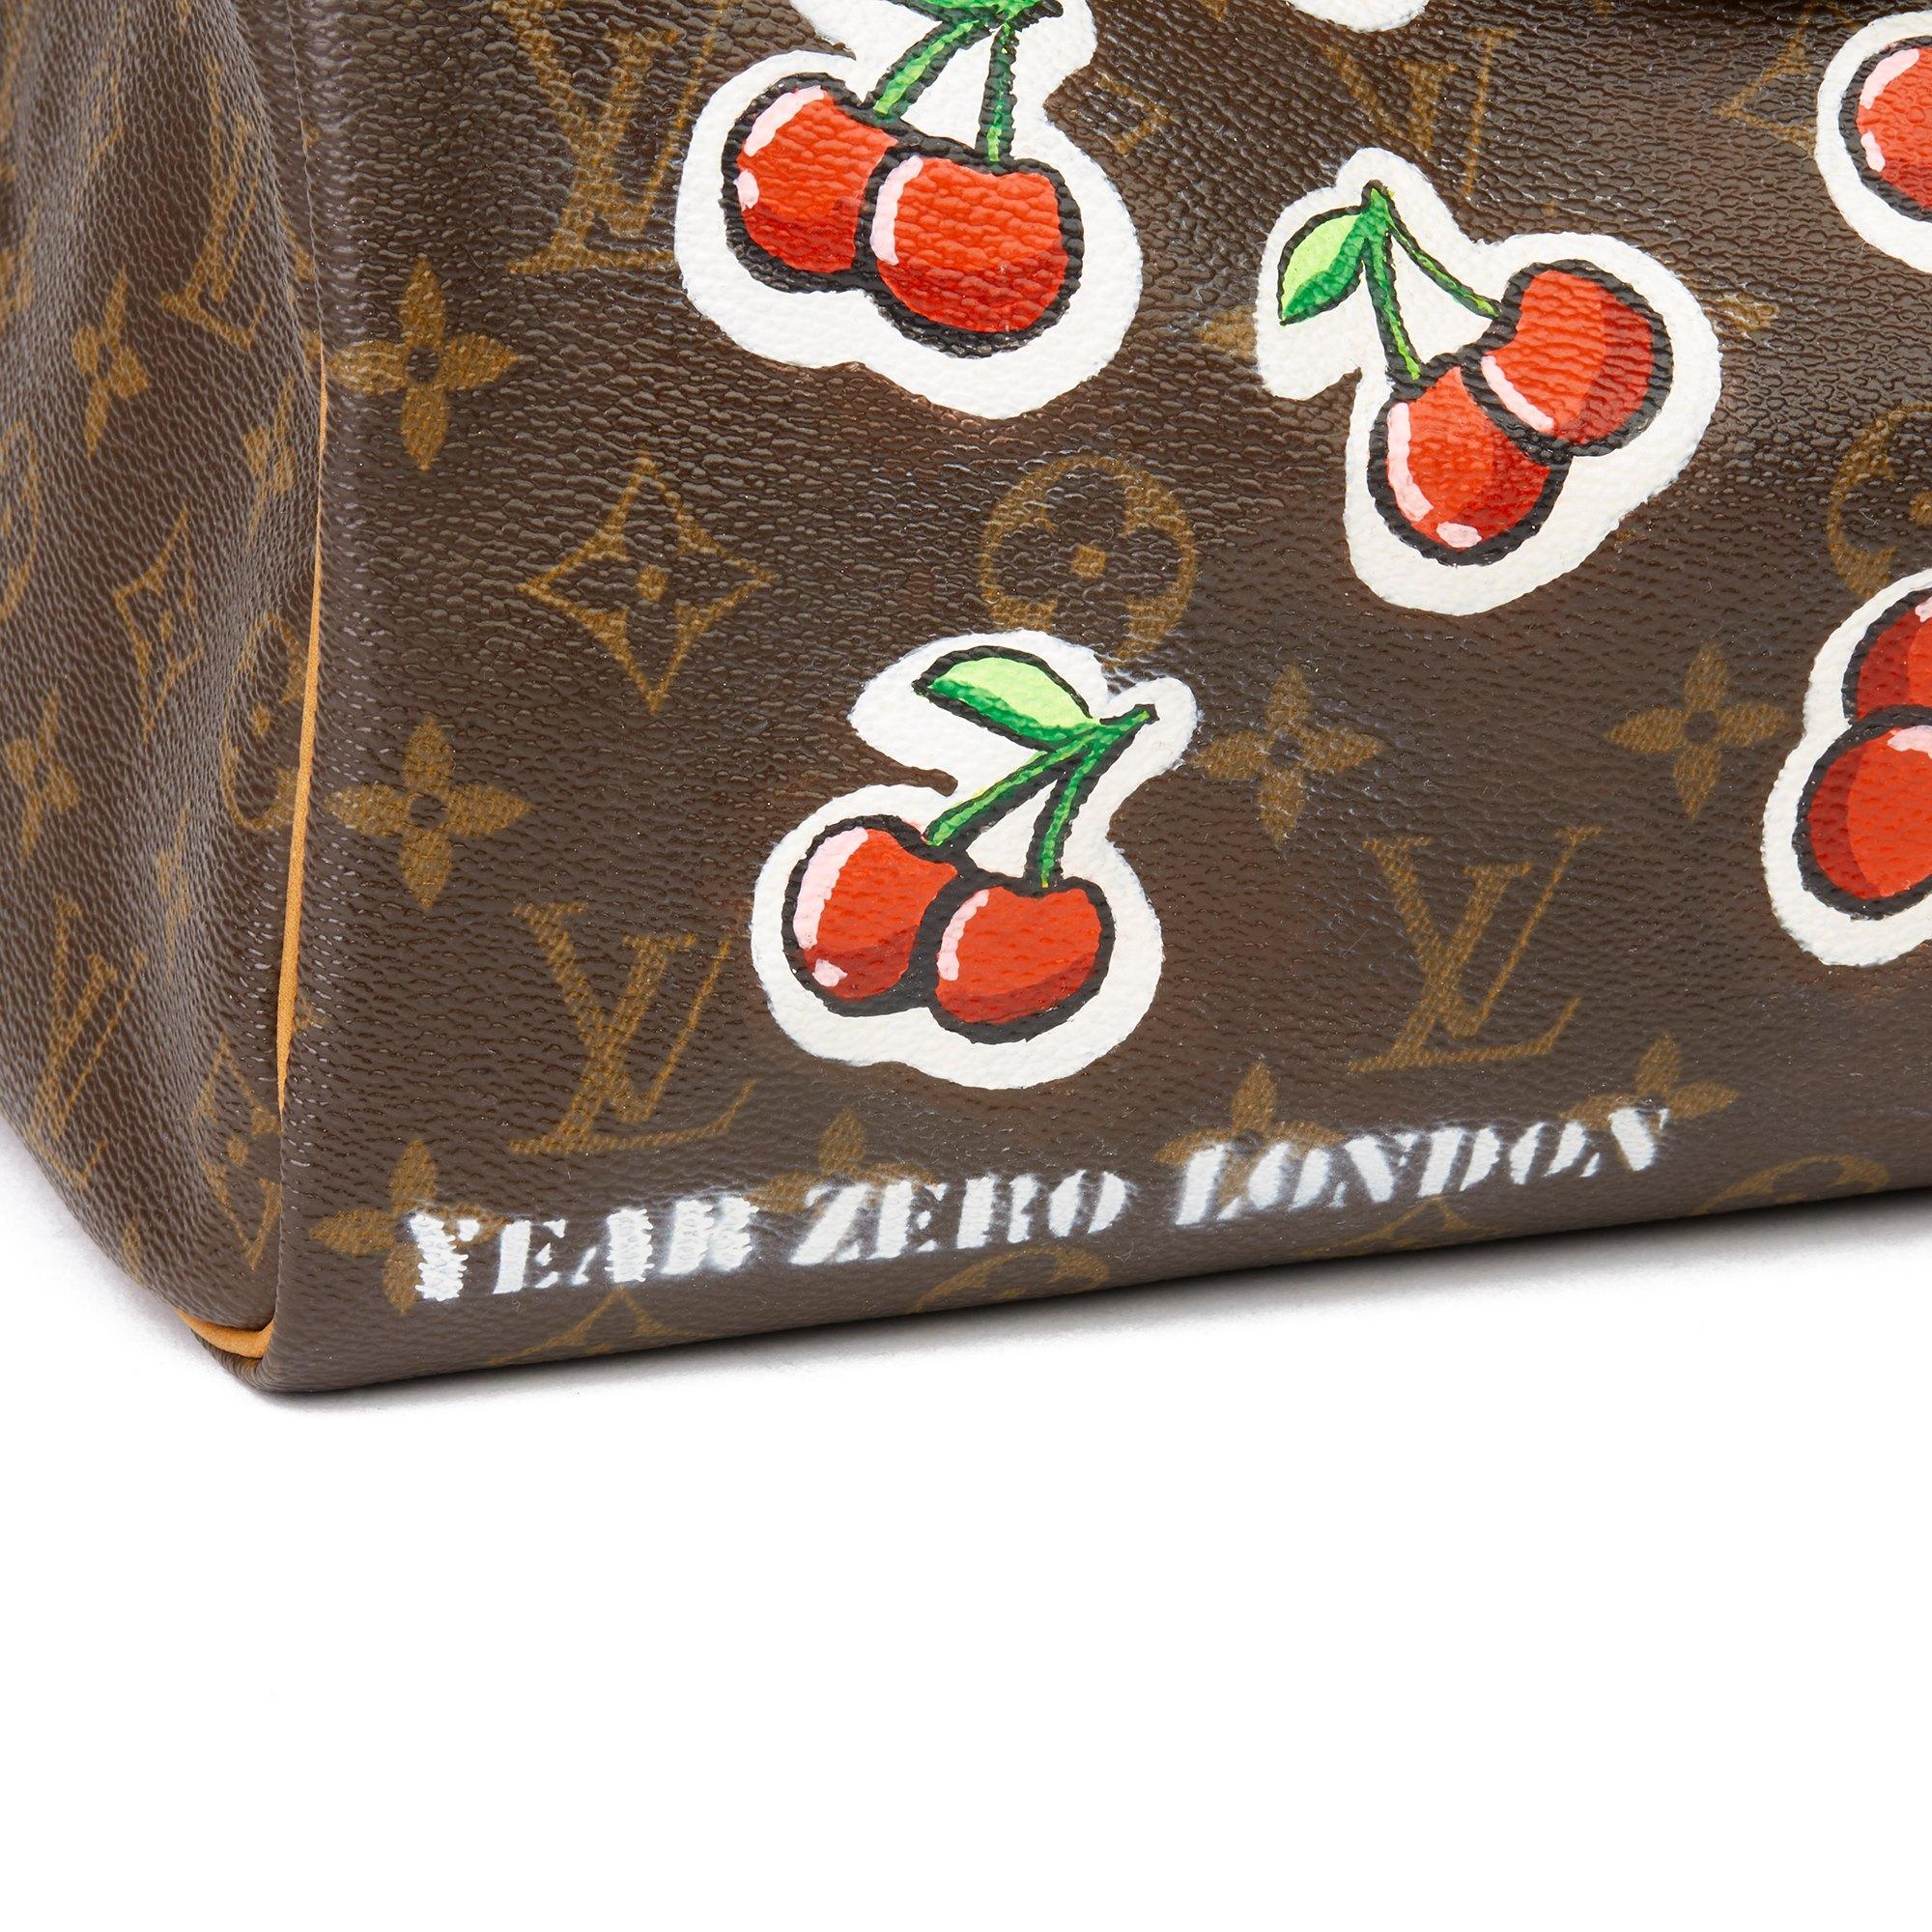 Louis Vuitton X Year Zero London Hand-painted 'Cherries' Brown Monogram Coated Canvas Speedy 30